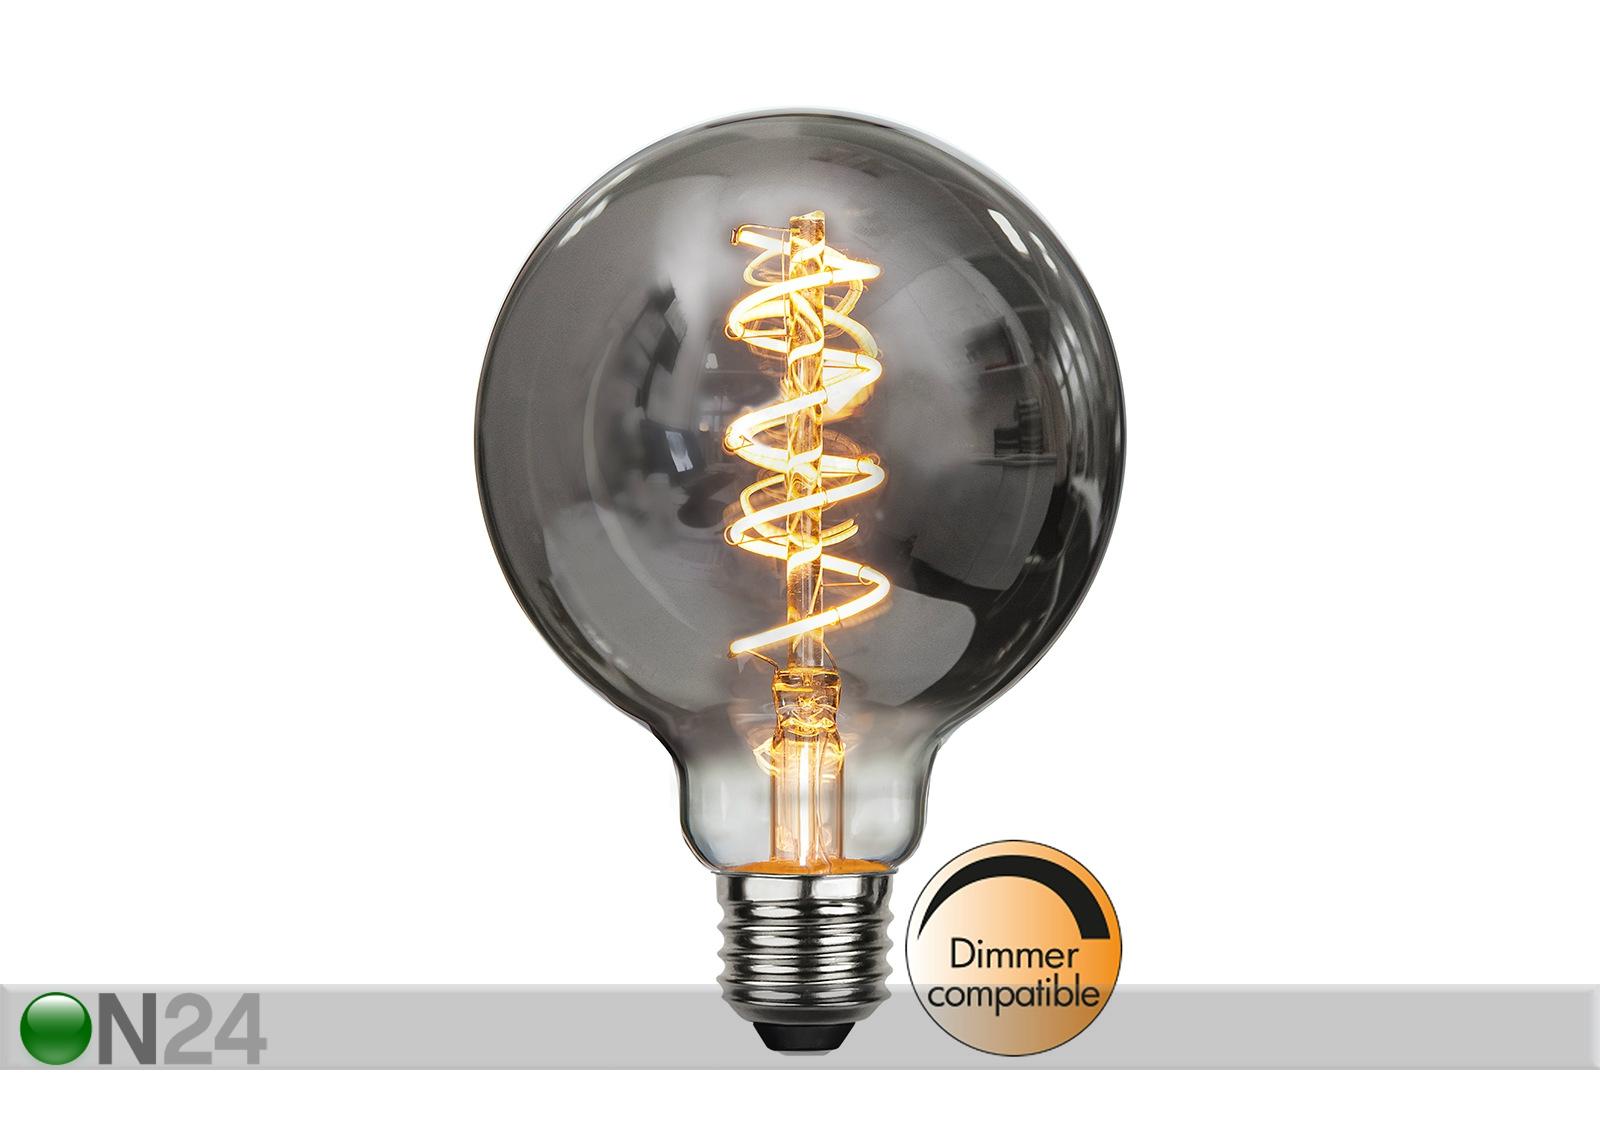 4ef6e2d7932 Dekoratiivne LED pirn E27 4 W AA-155248 - ON24 Sisustuskaubamaja